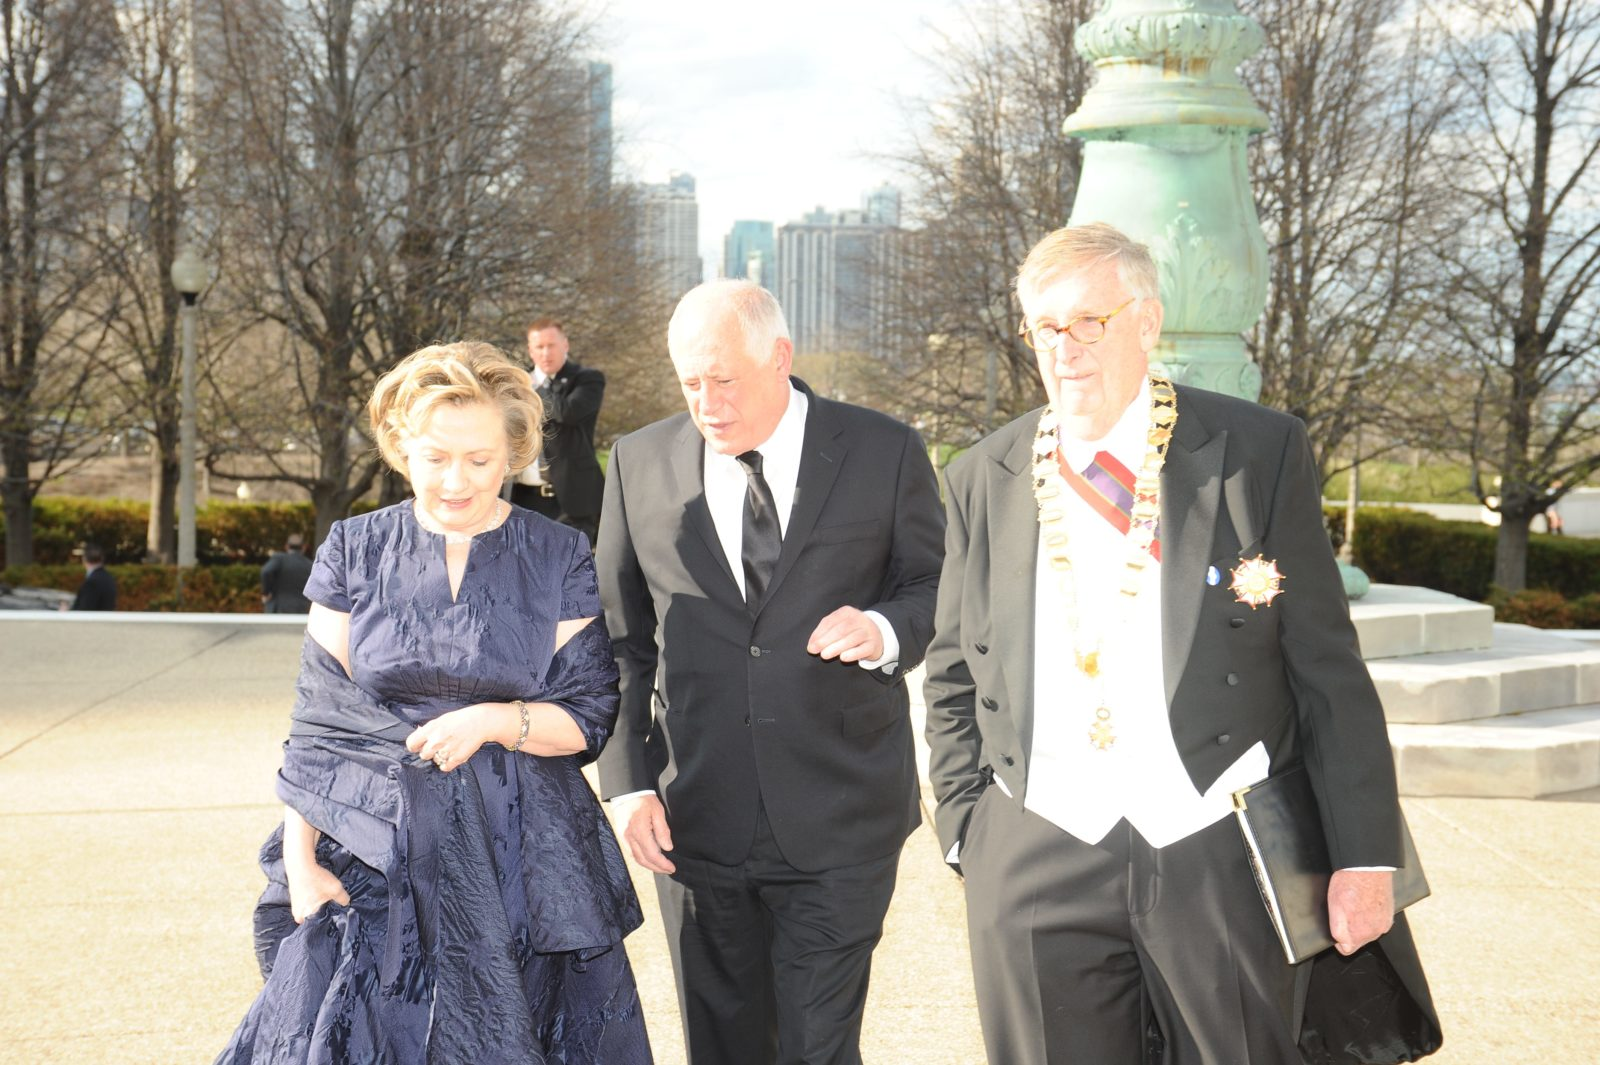 saturday-night-gov-pat-quinn-chancellor-thomas-s-johnson-greet-secretary-hillary-rodham-clinton-upon-arrival-at-the-field-museum-14